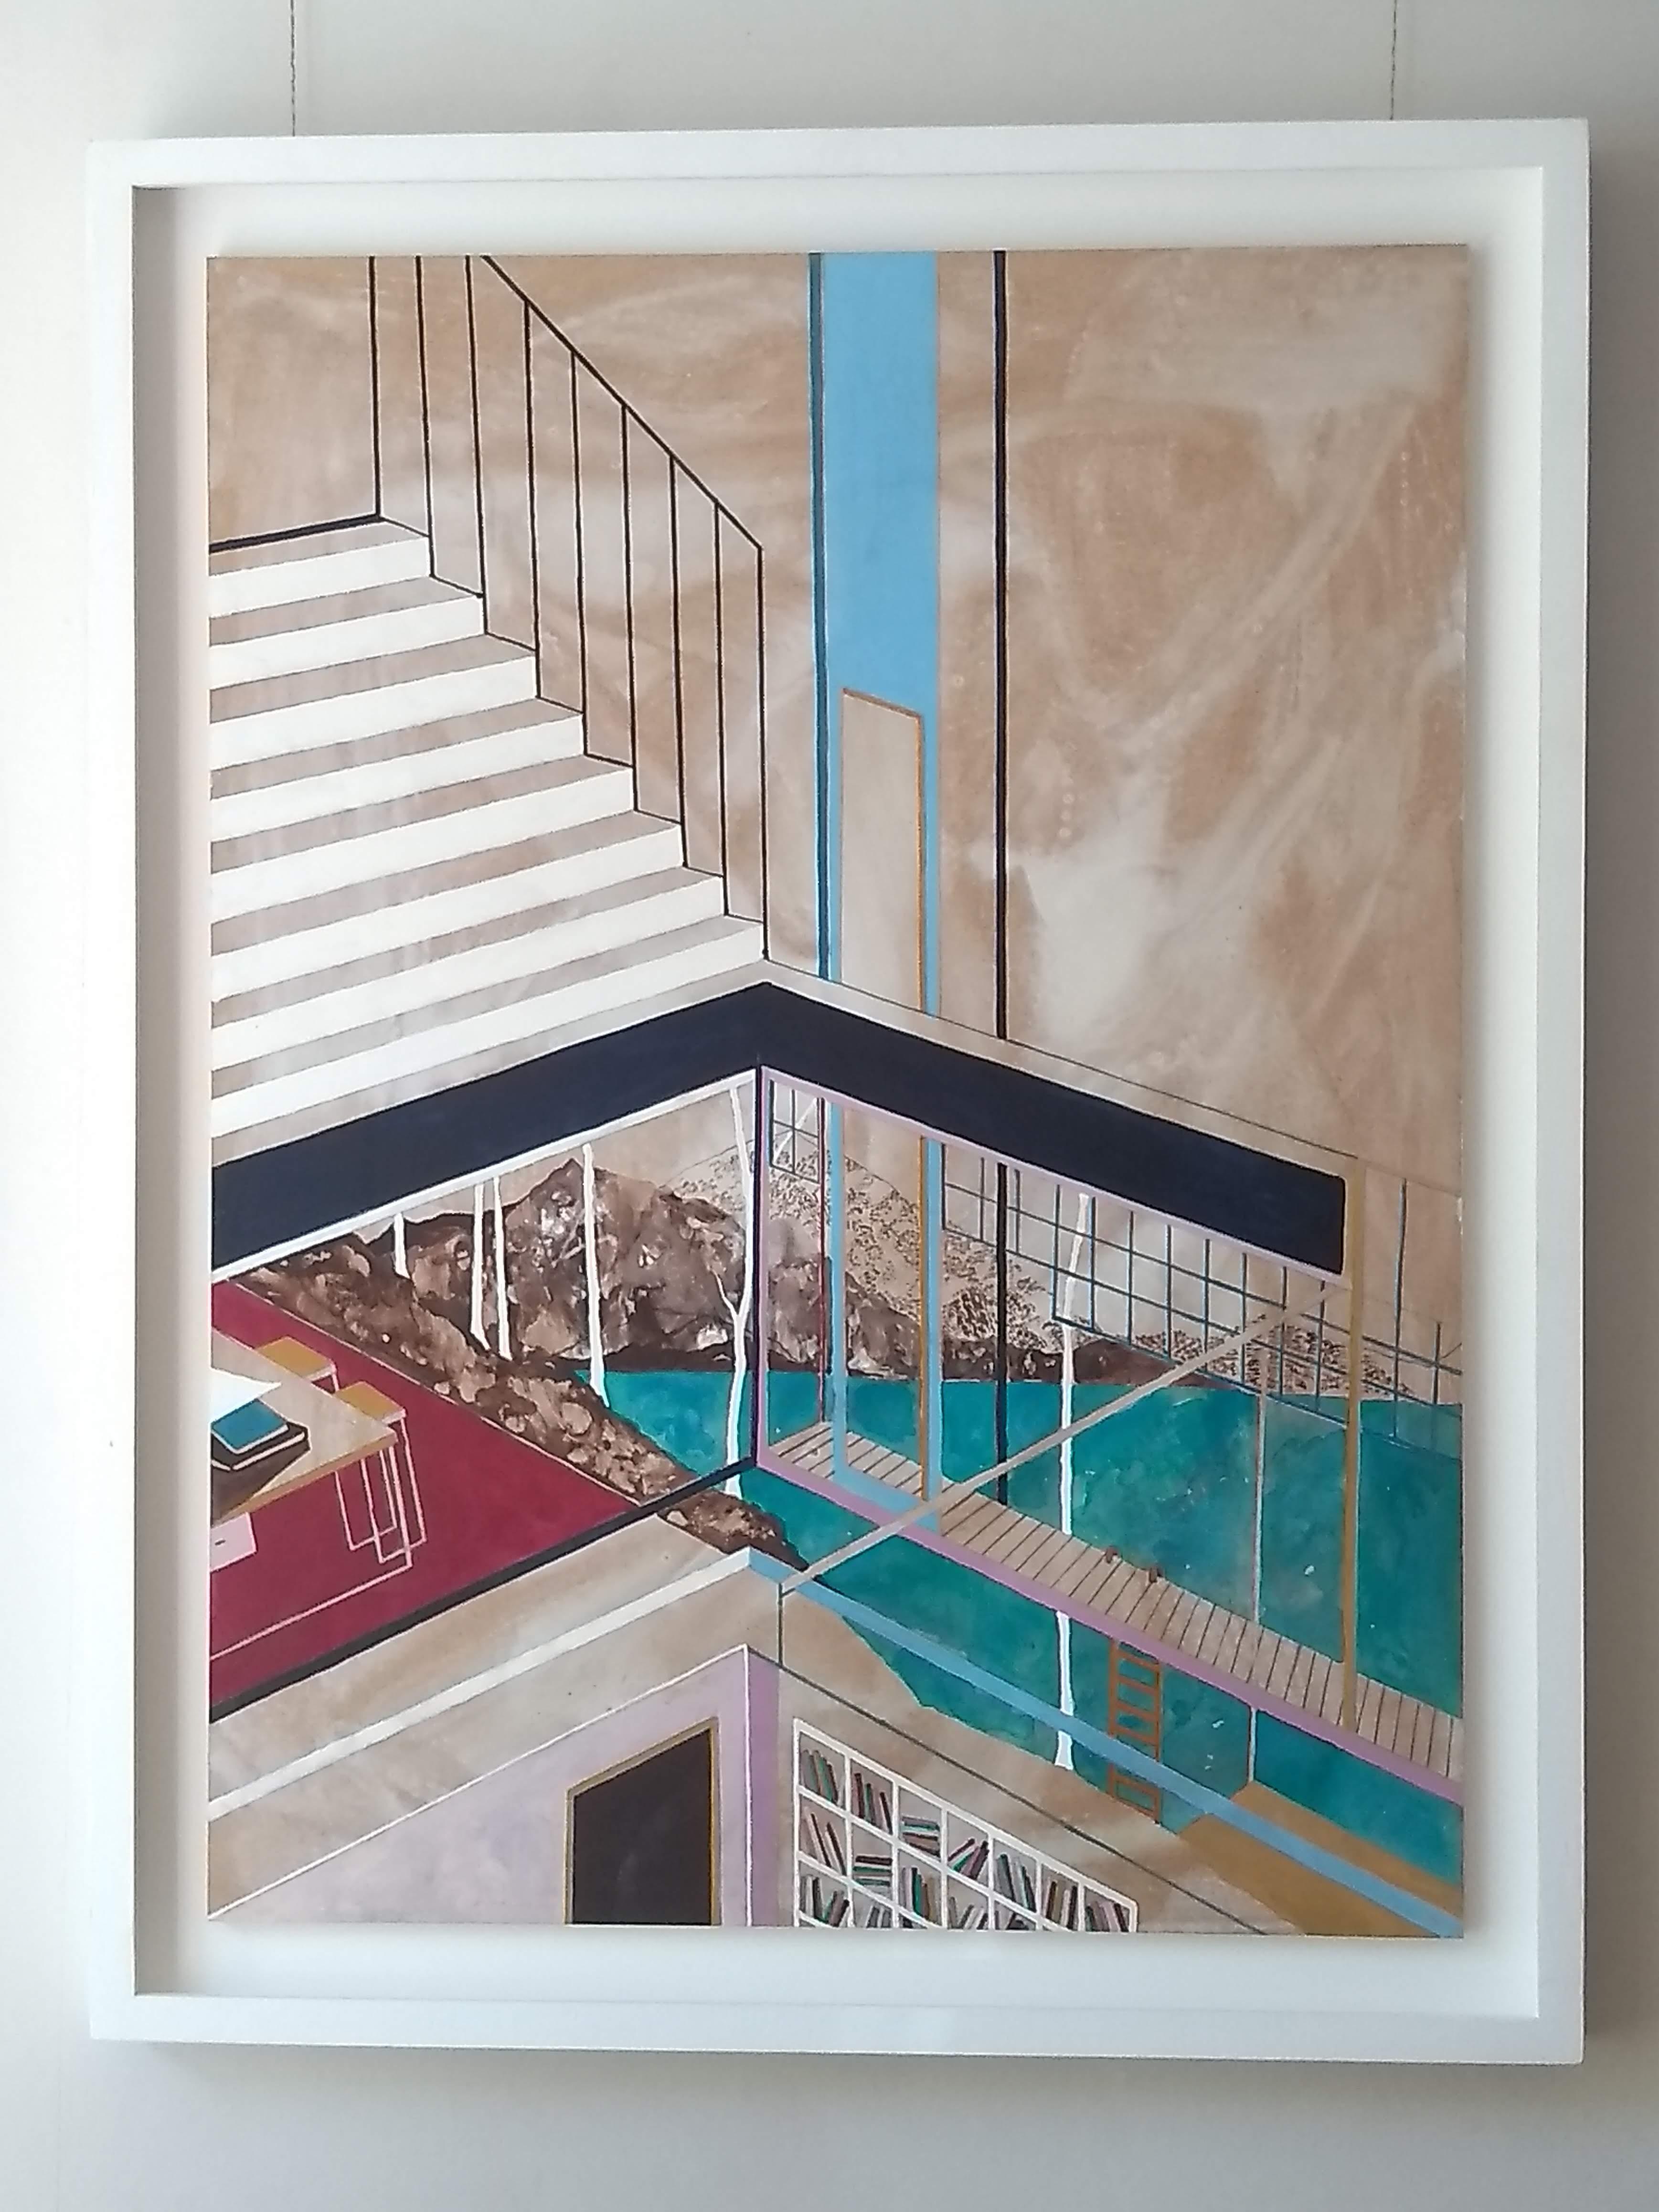 Artwork by Charlotte Keates